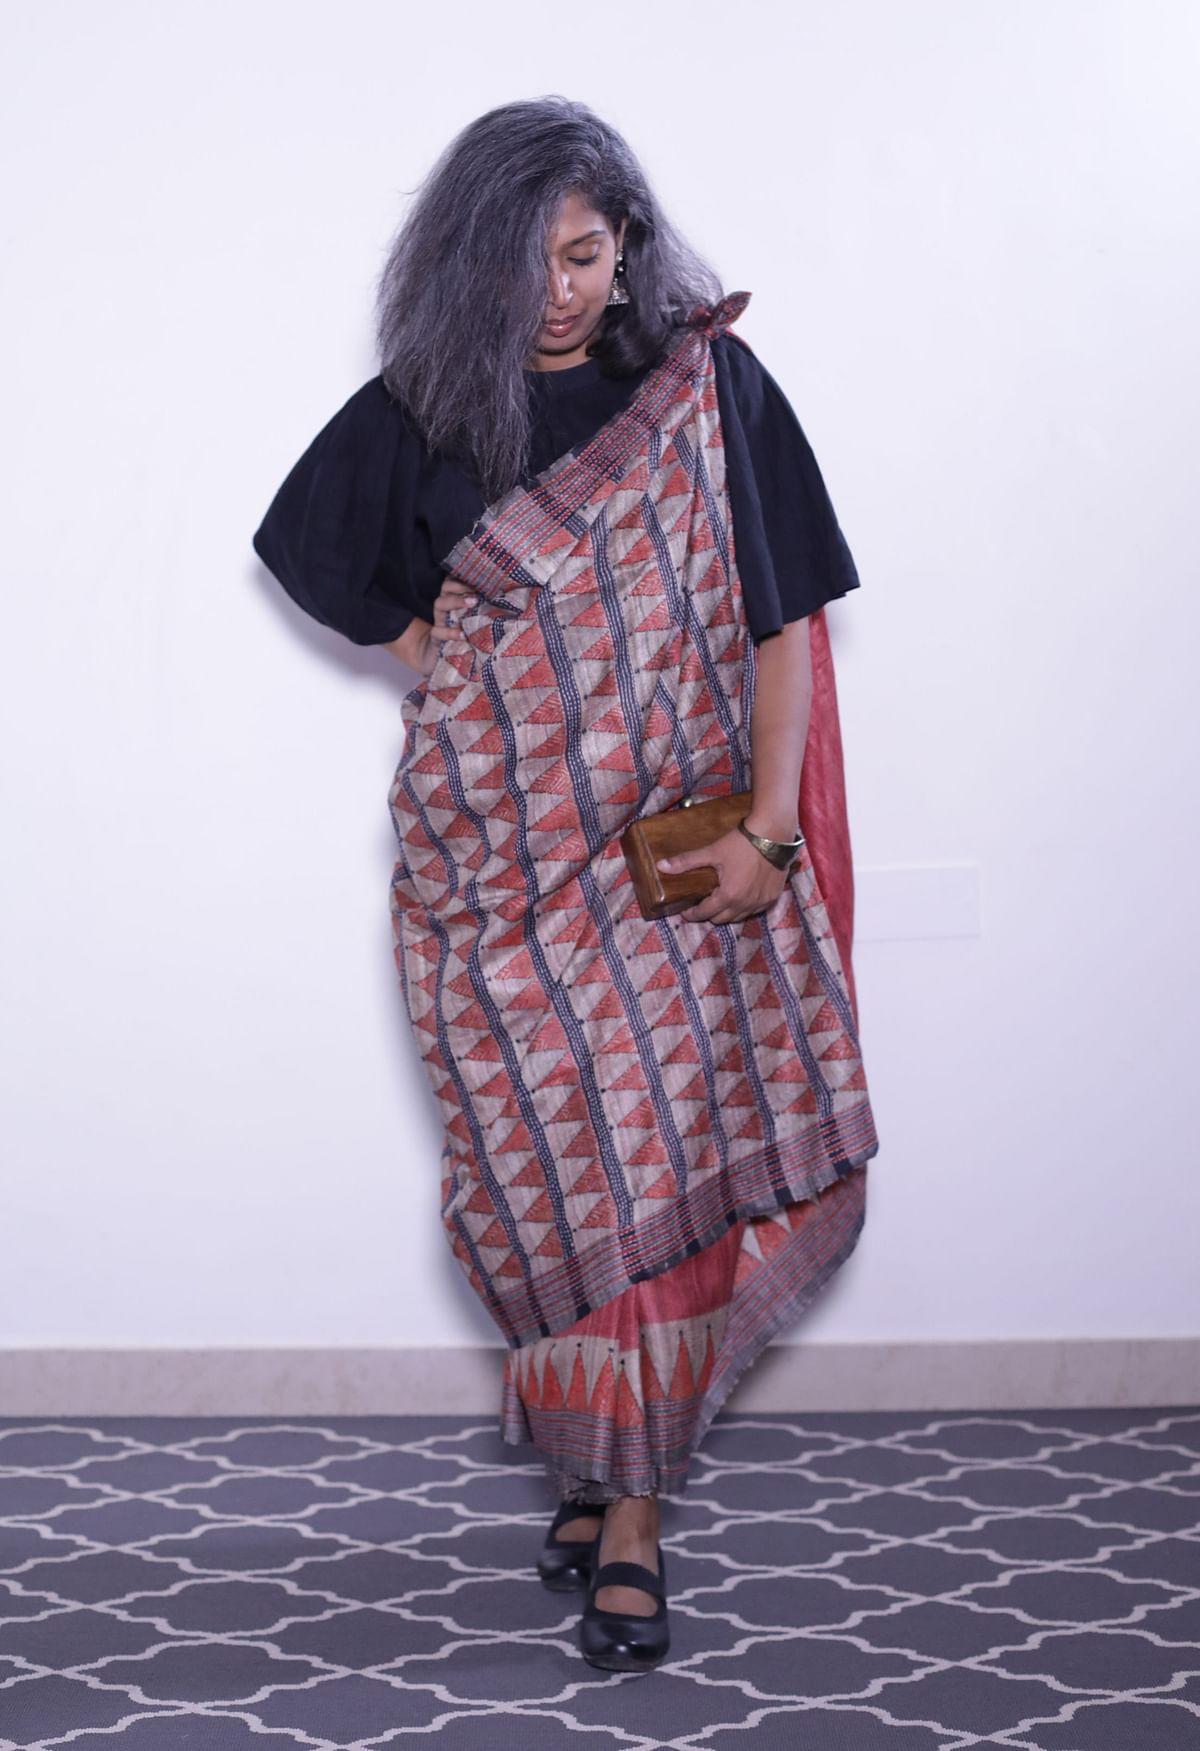 Aparna show off the Karnataka style drape.